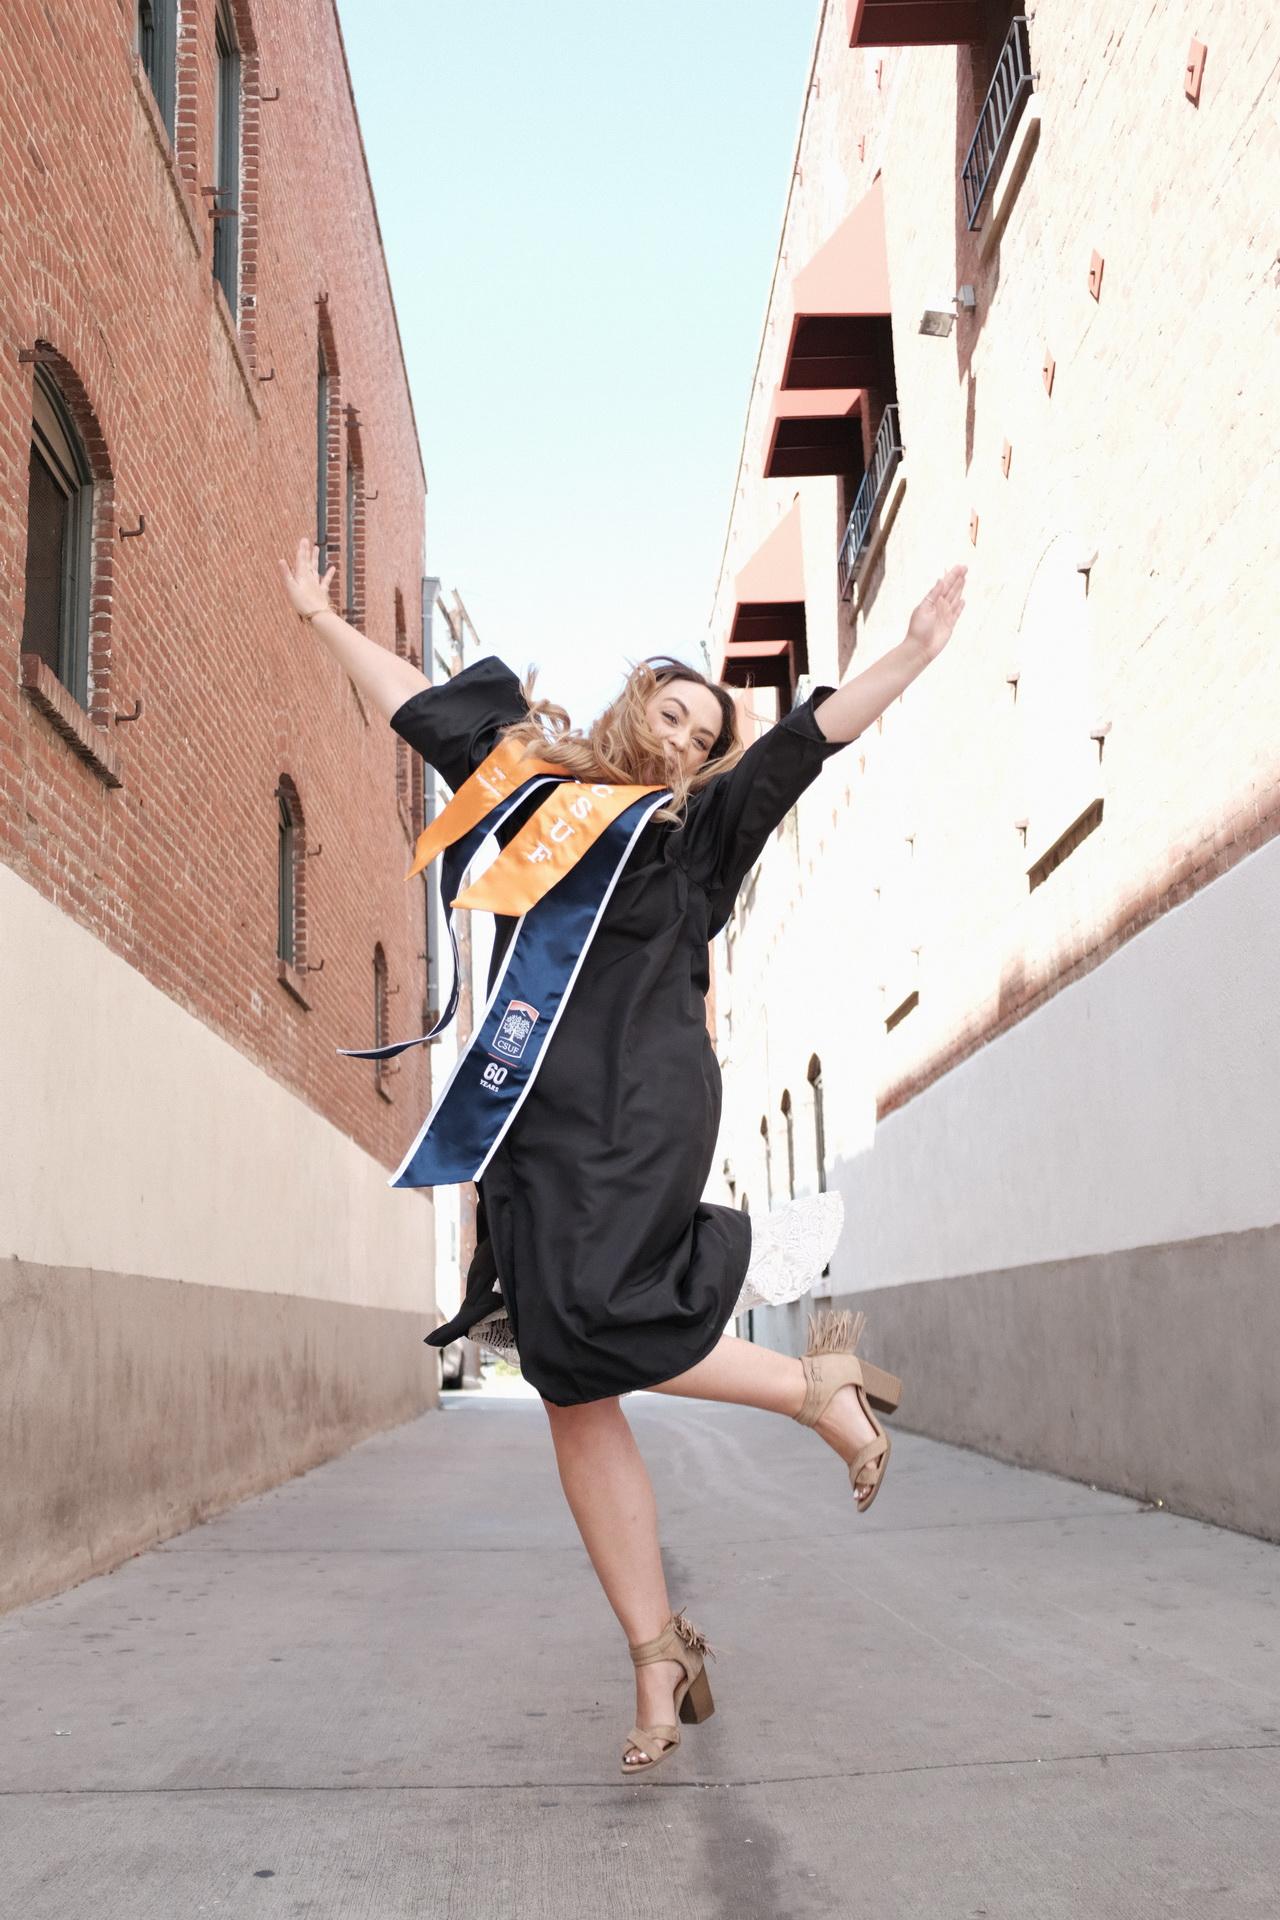 graduation photos orange county by nicole caldwell studio 14